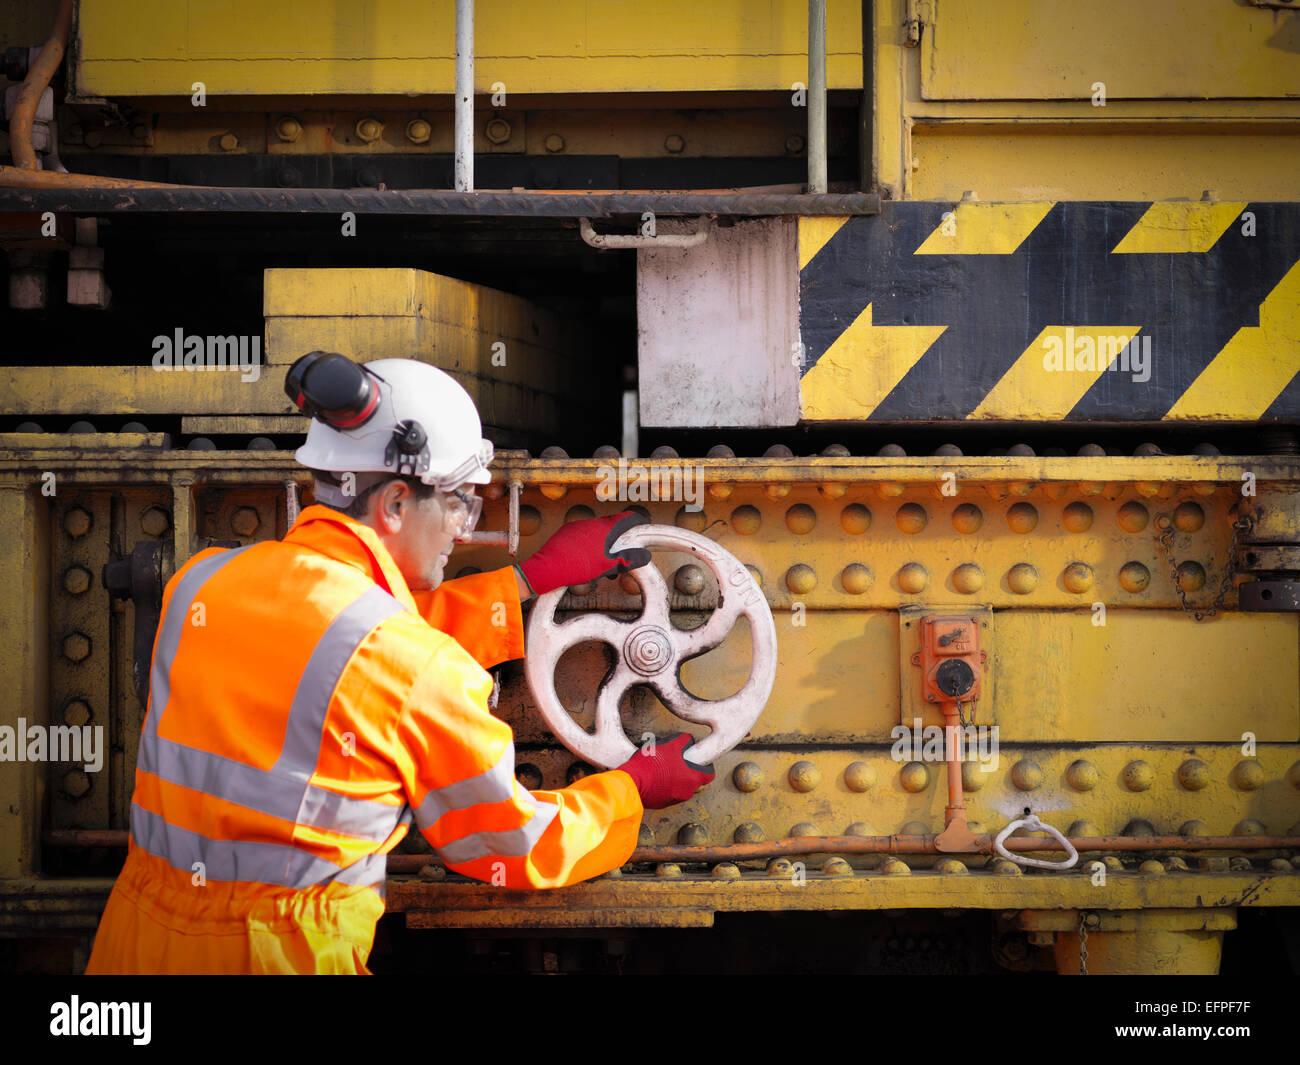 Railway worker turning wheel on maintenance train on railway - Stock Image